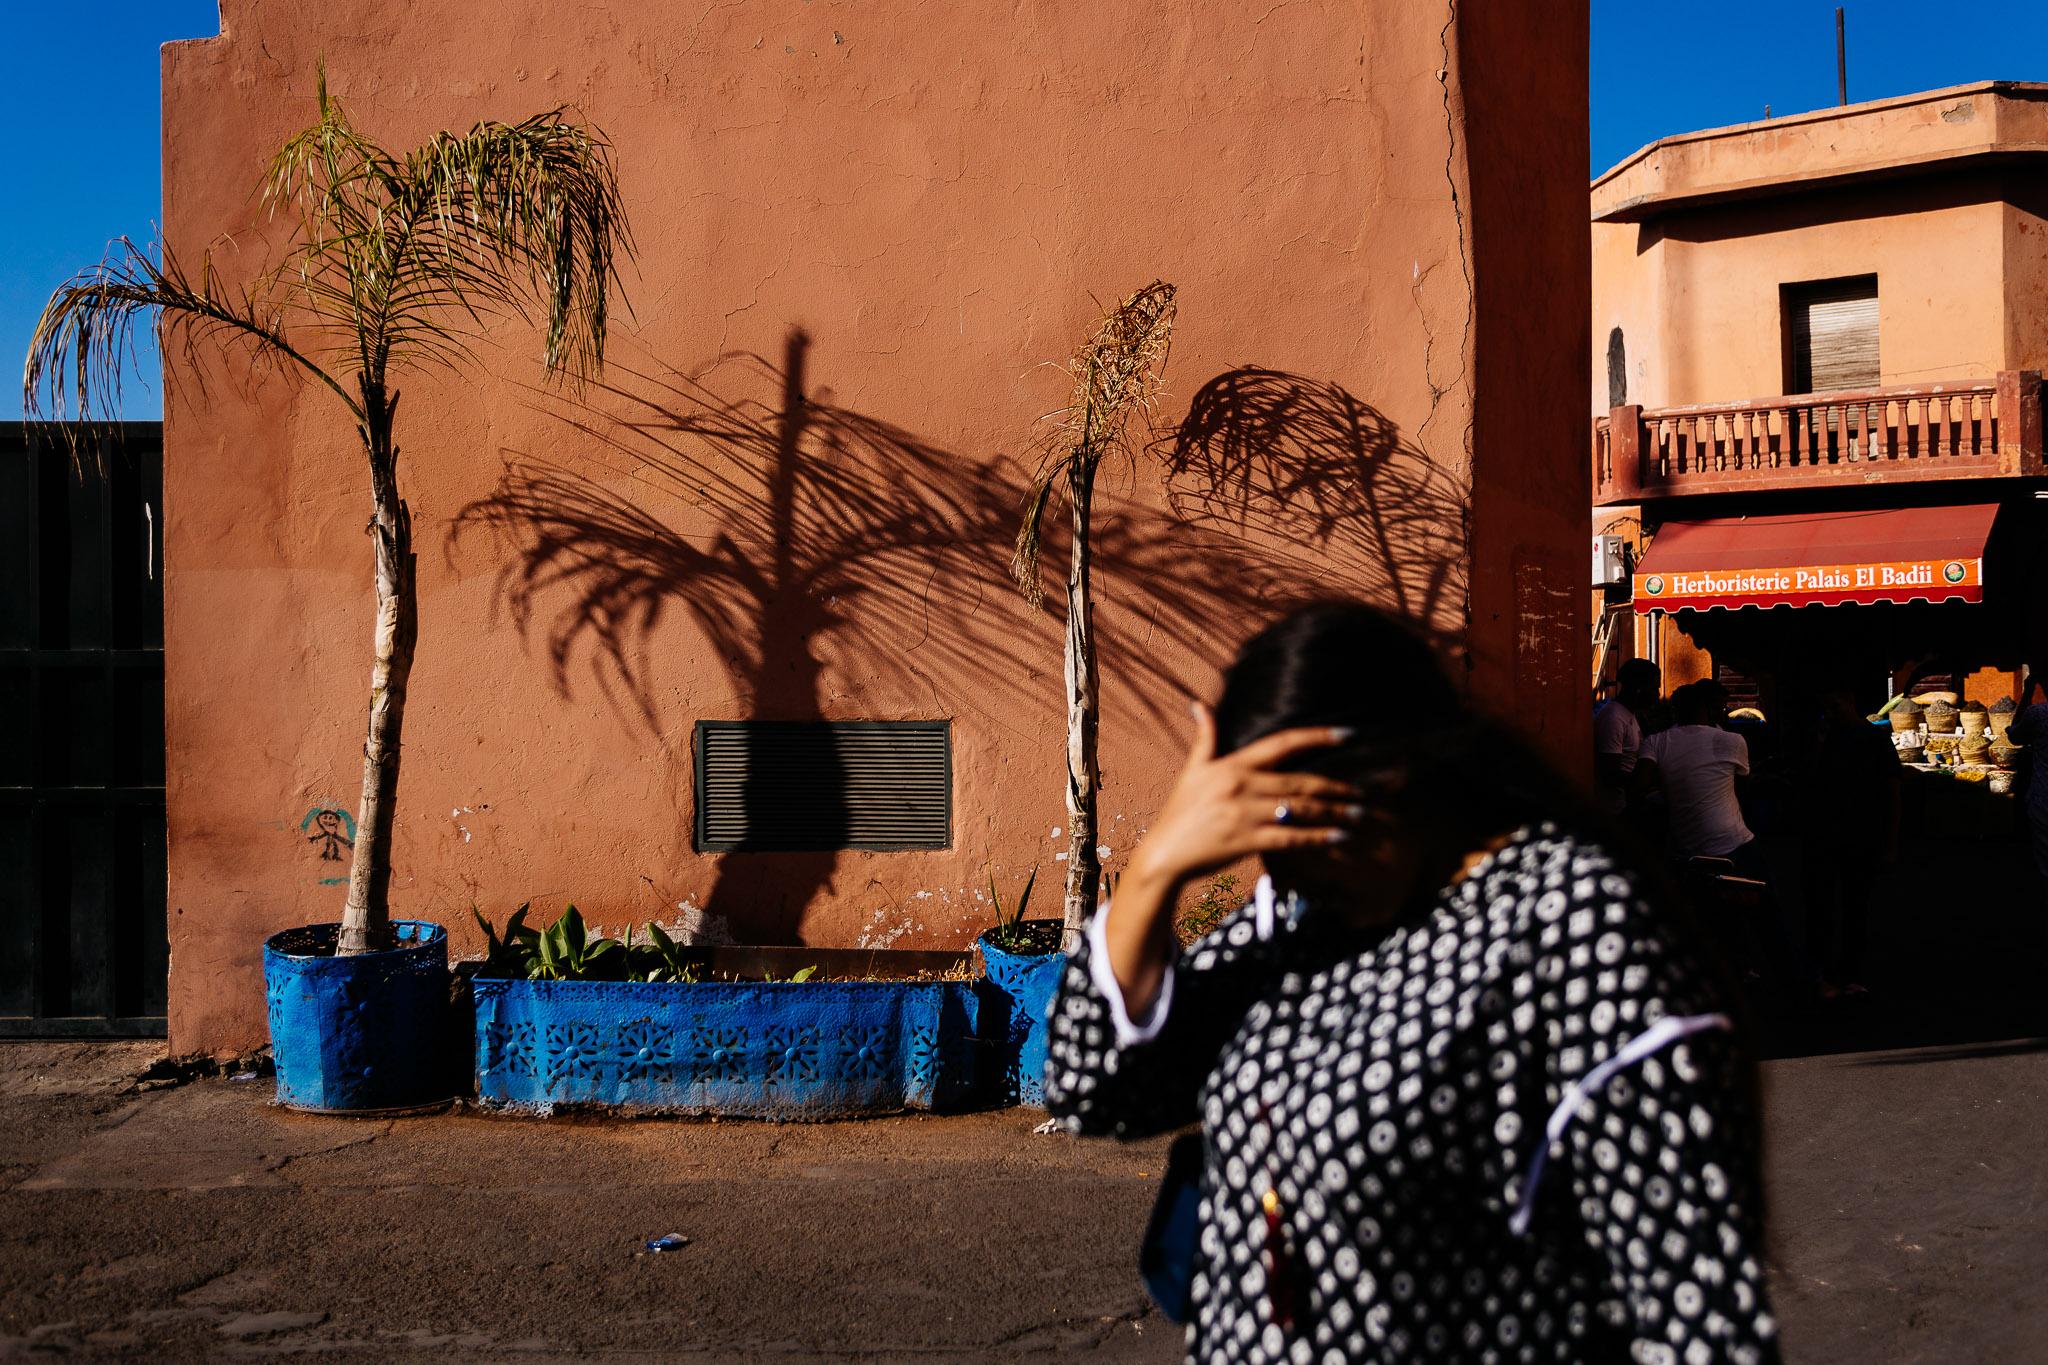 kubousfoto_fotograf_brno_marrakech_MG_4082